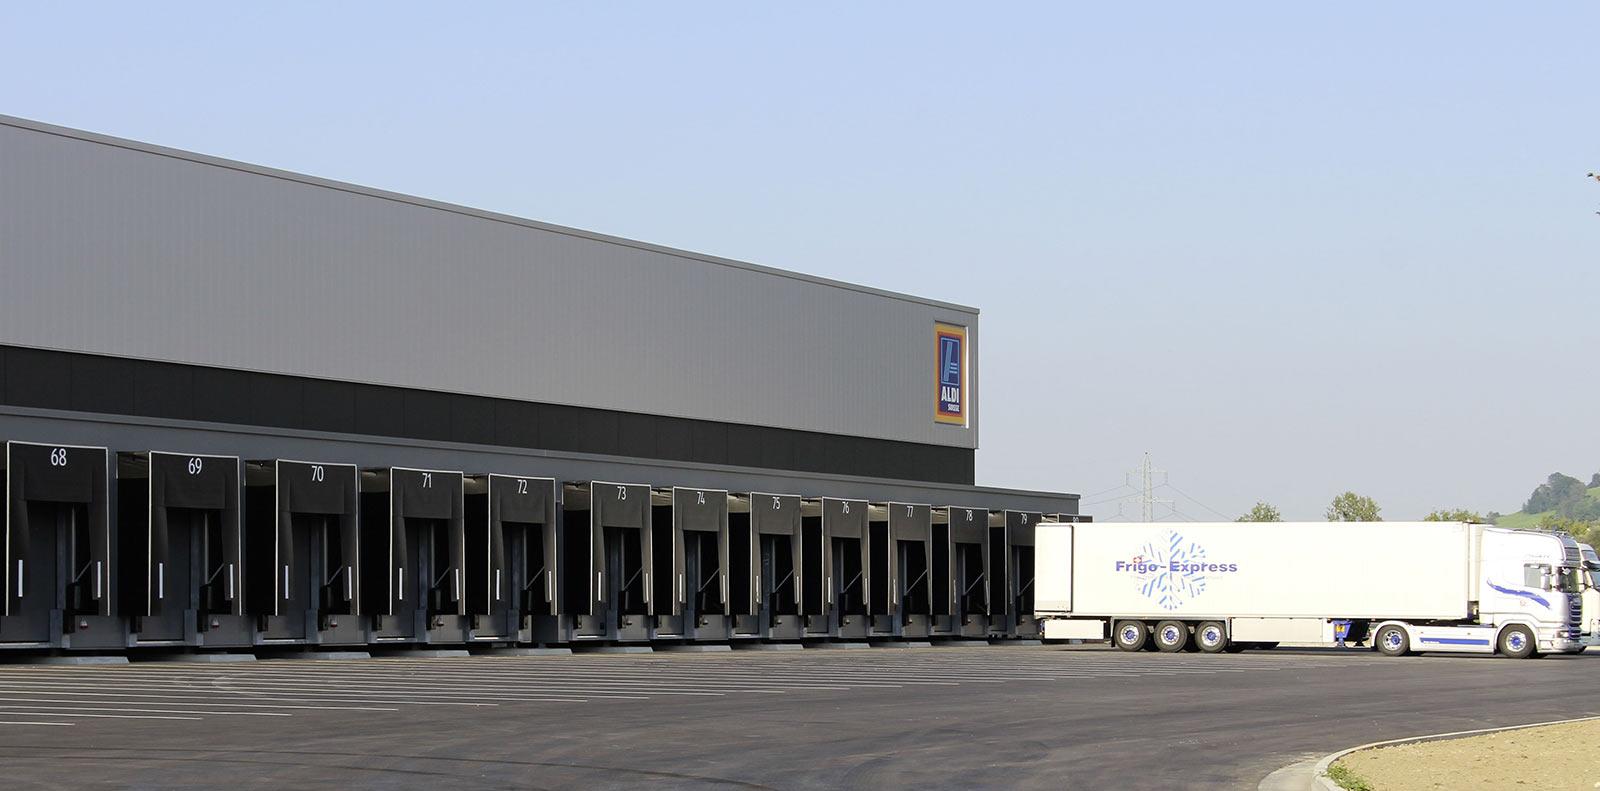 The logistics center has 80 loading bays. Photo: ATP/Kompatscher